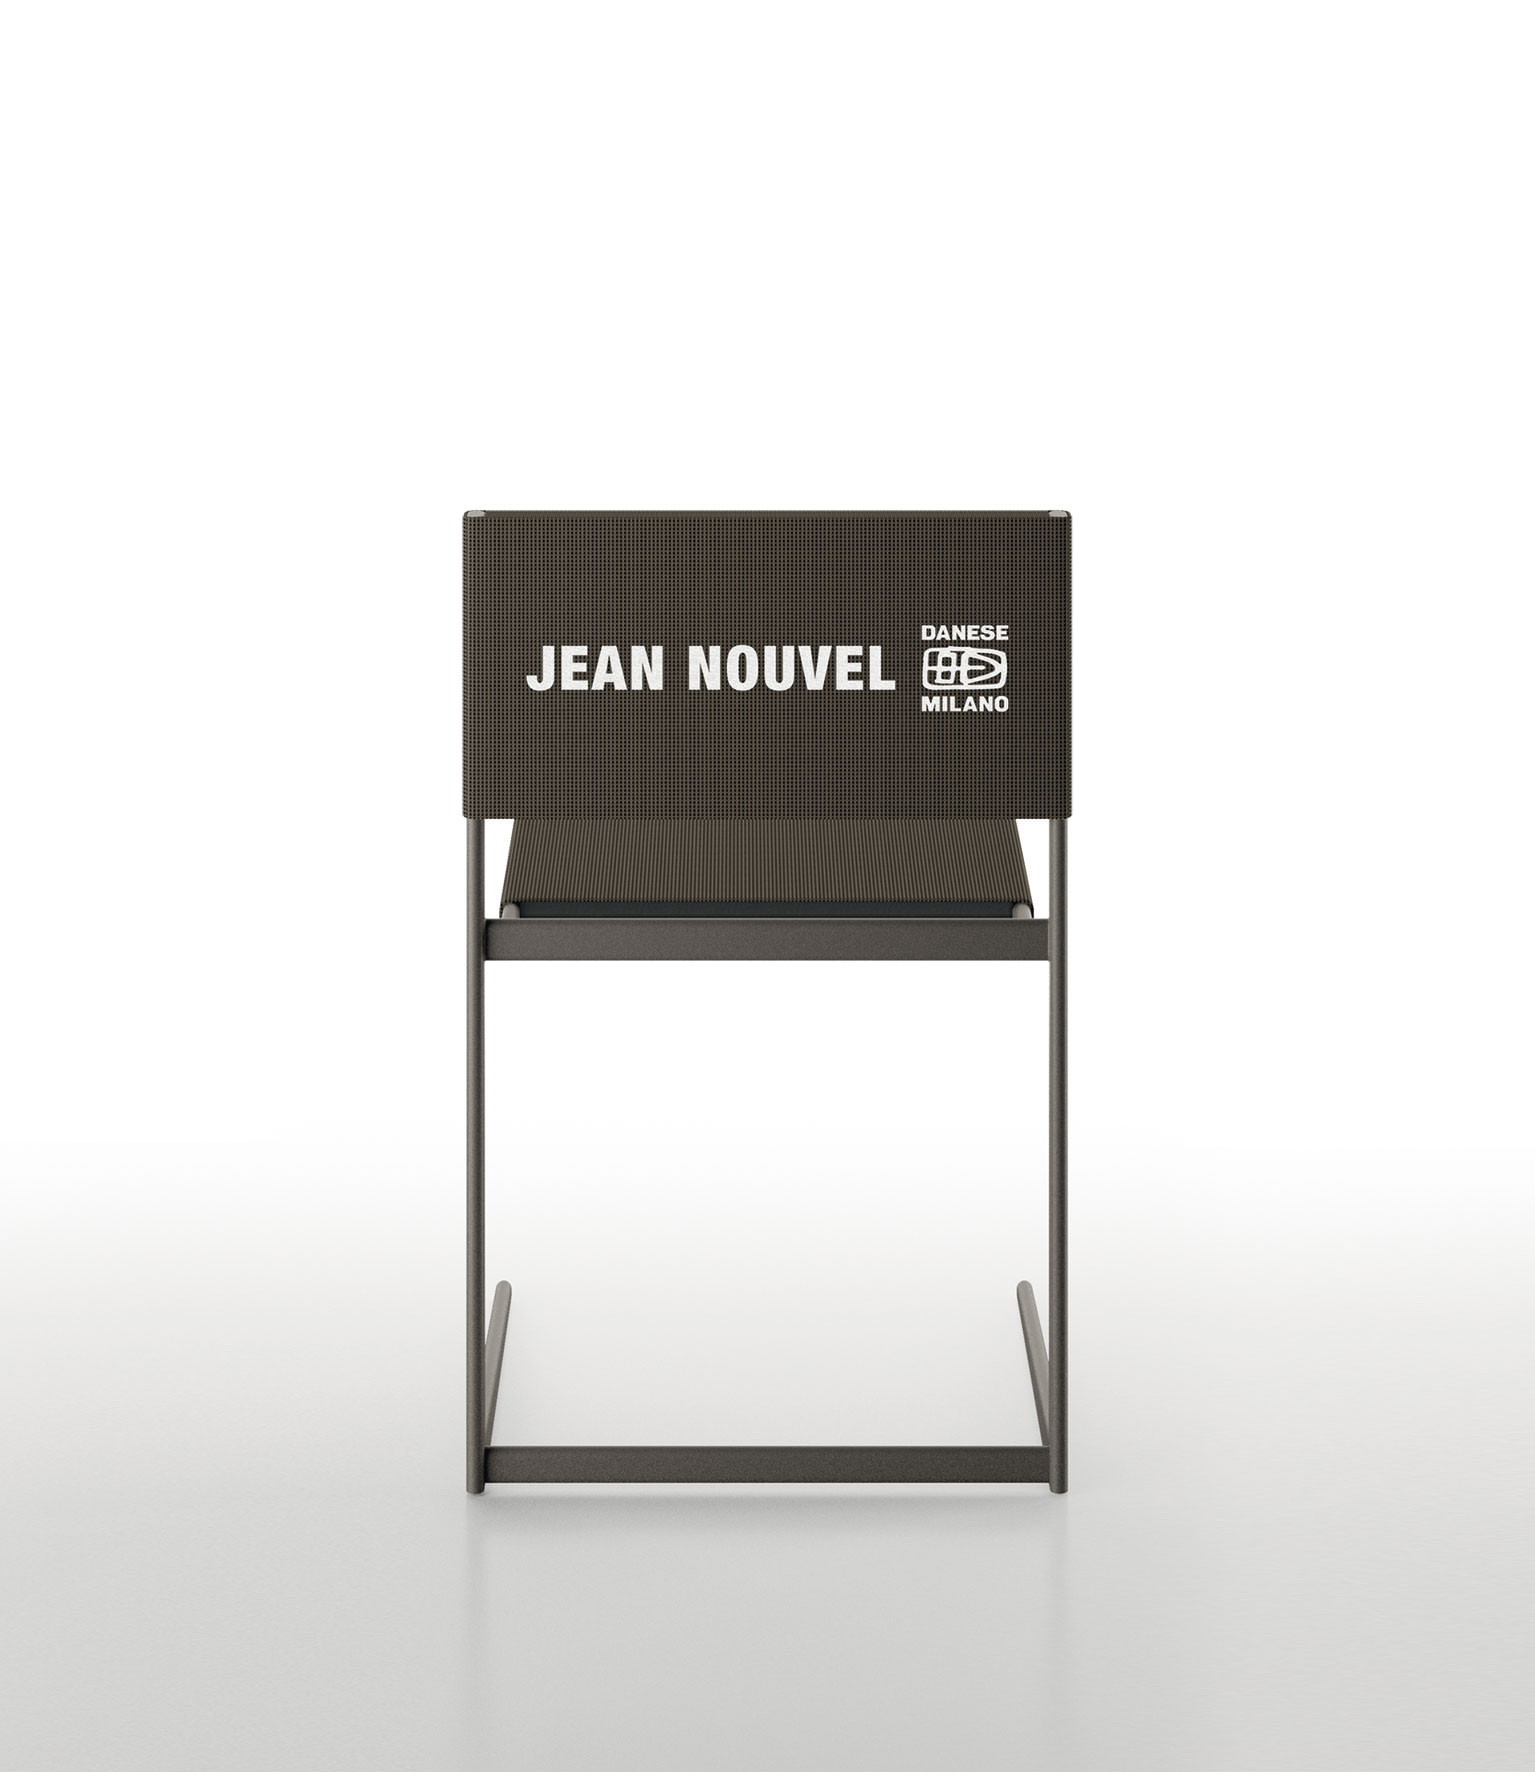 Moritz jean nouvel design for Jean nouvel design